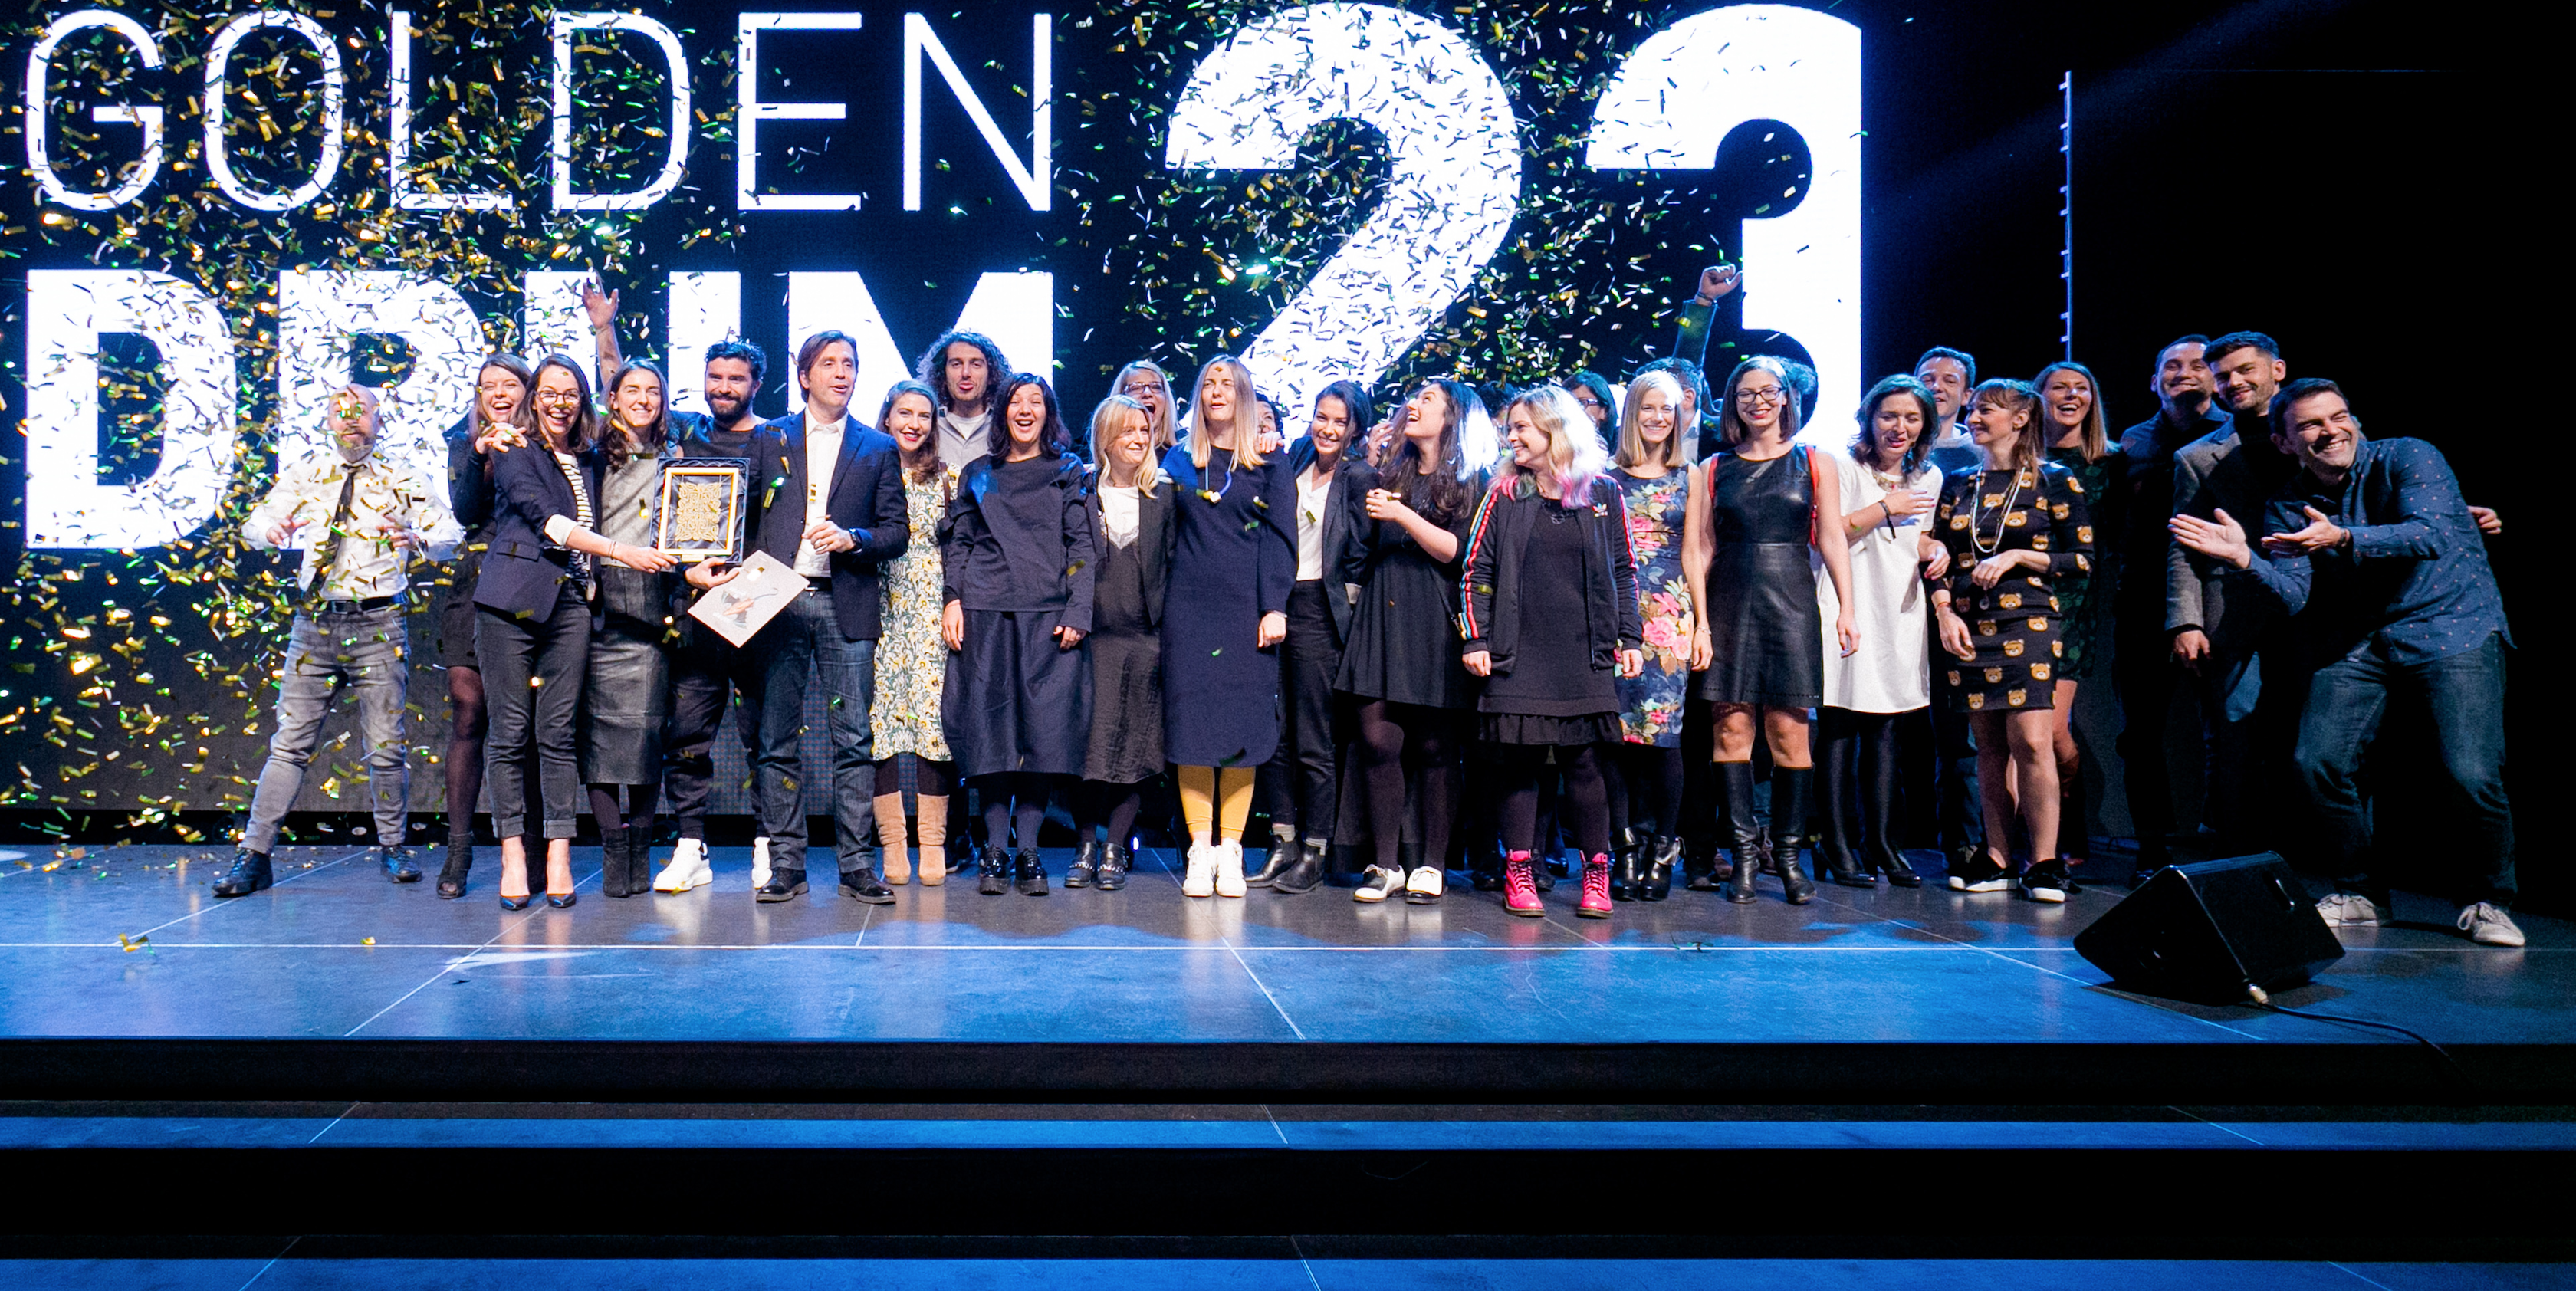 Tryumf polskich firm na Golden Drum 2016 Nagrody mediarun goldendrum